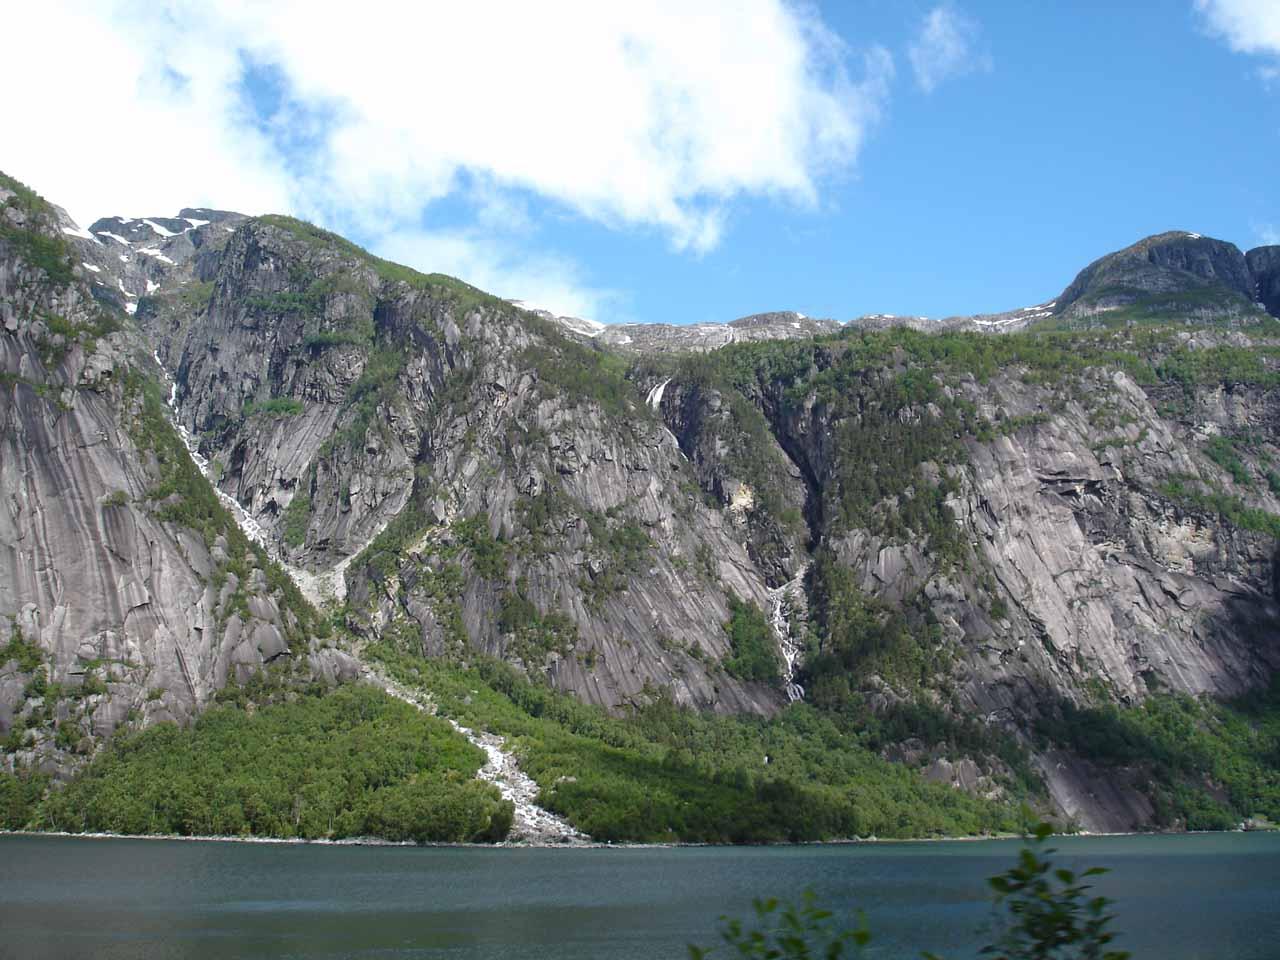 Looking across Simadalsfjorden towards some thin cascades as we headed towards Simadalen